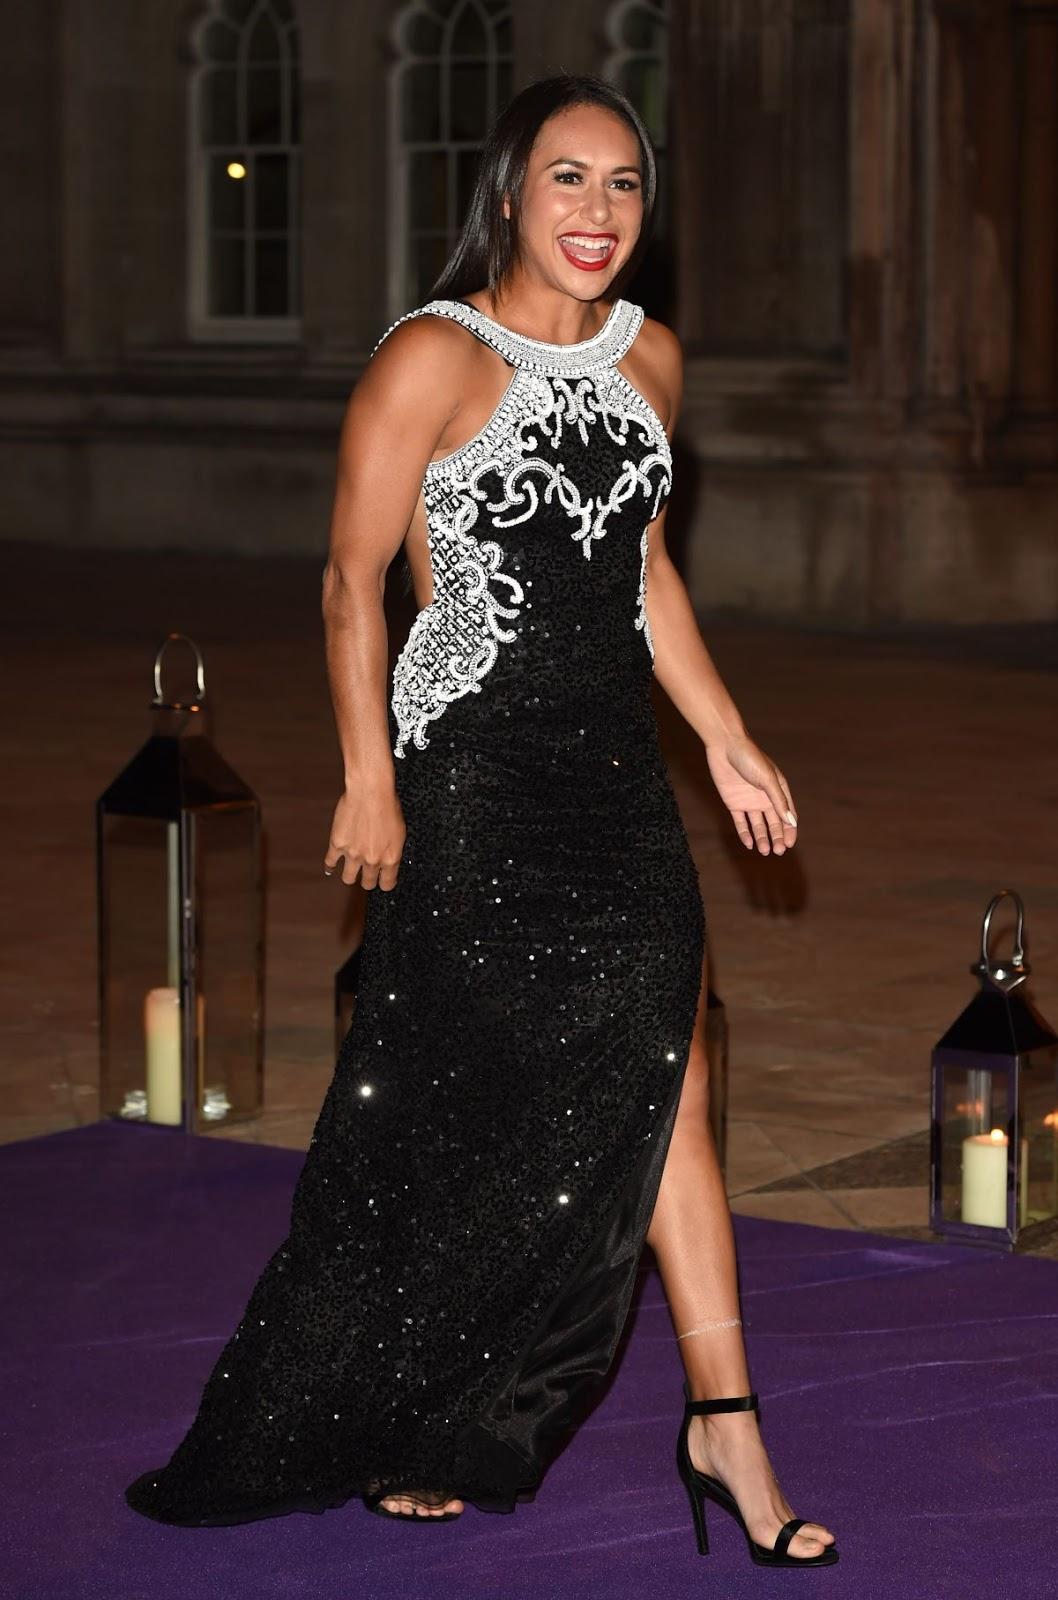 HD Photos of Heather Watson at Wimbledon Champions 2016 Dinner in London